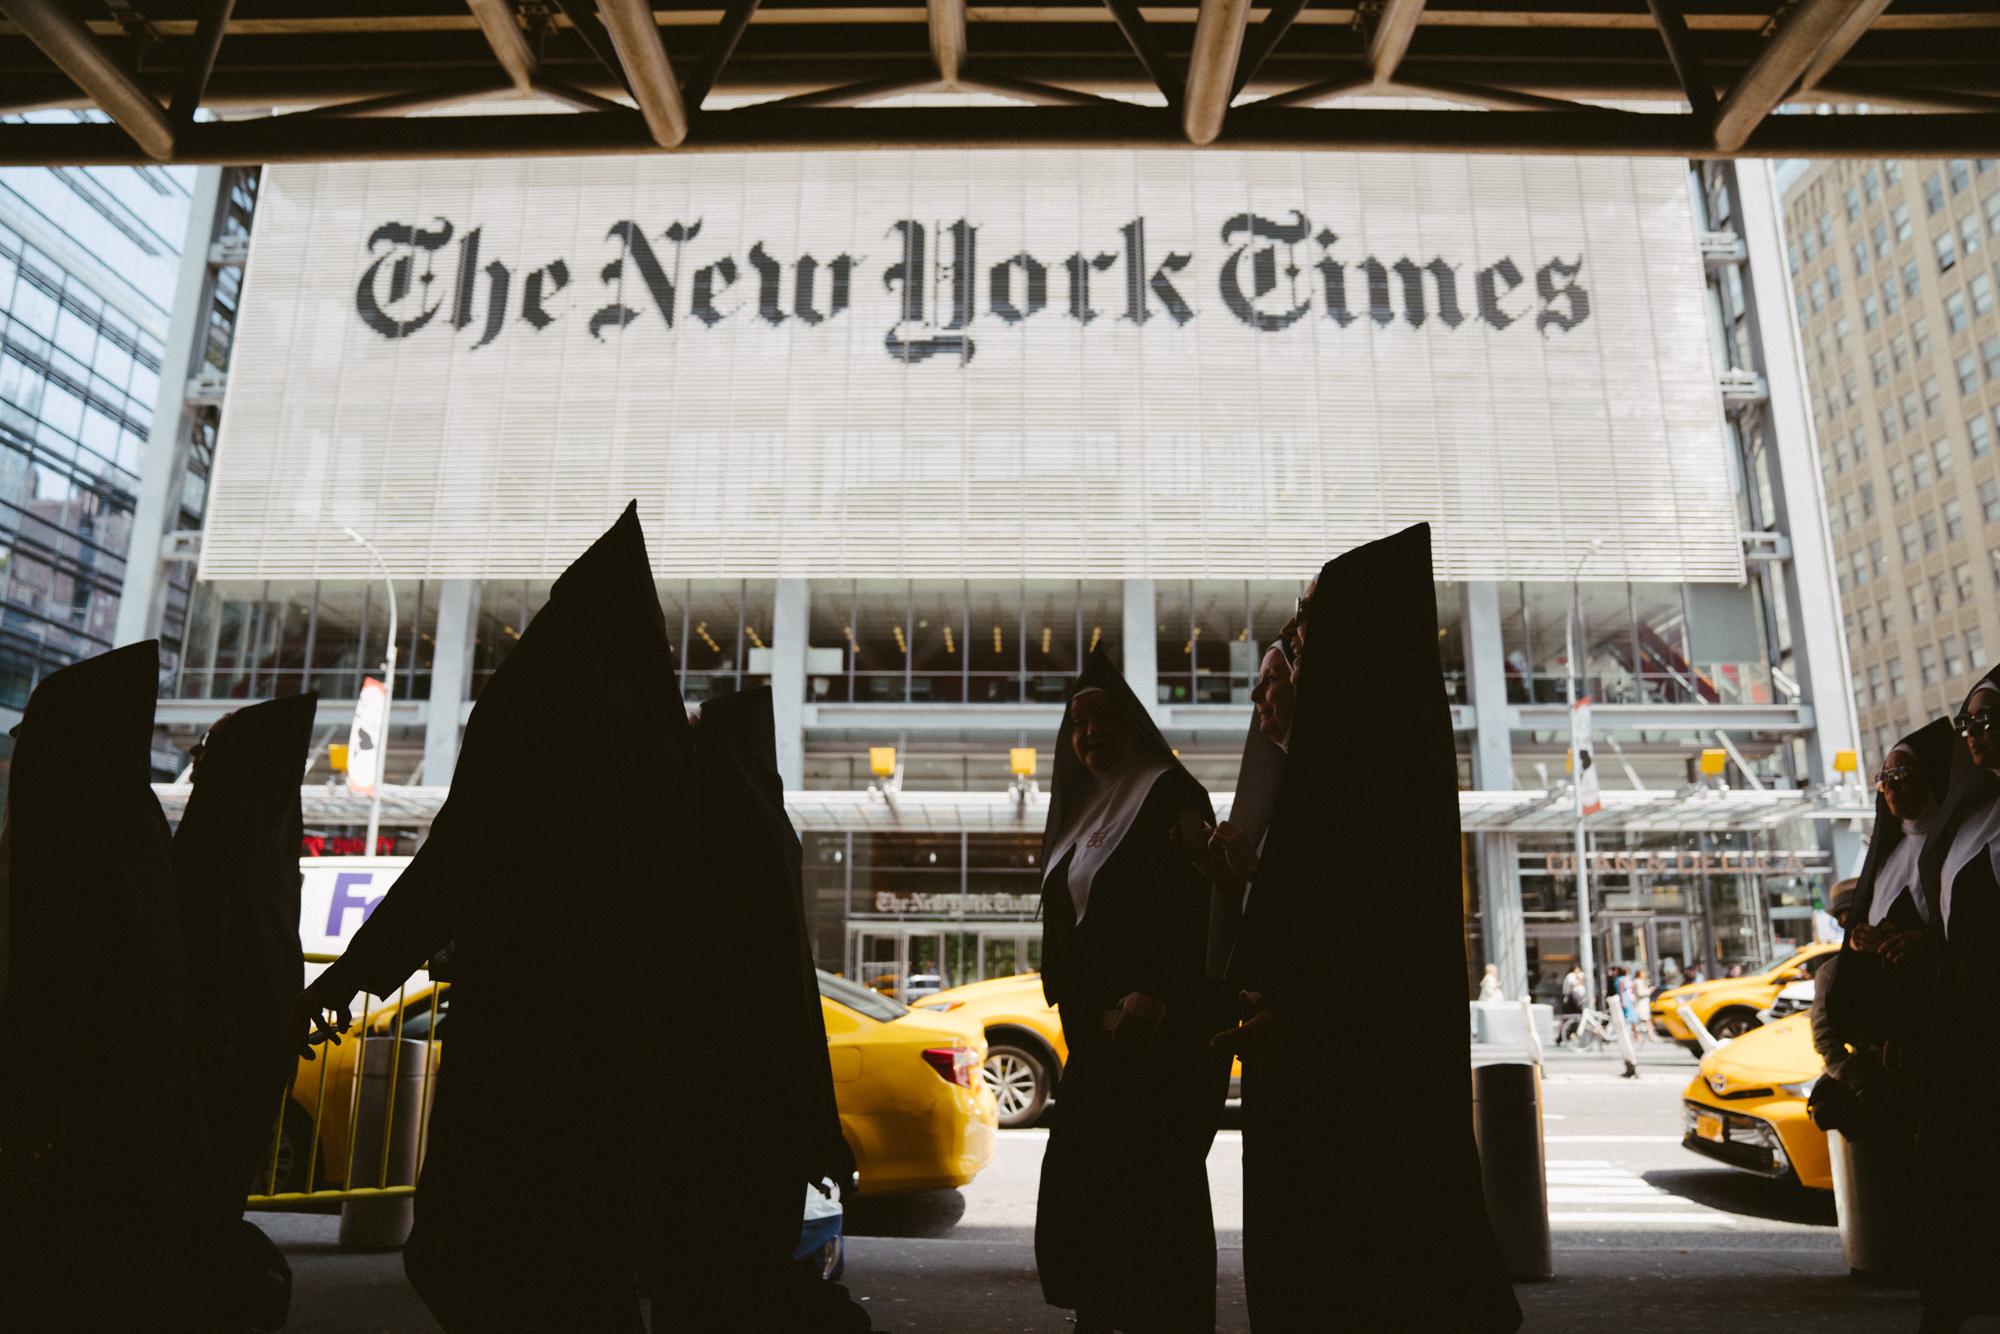 3 Good omens chattering nuns hal kirkland.jpg